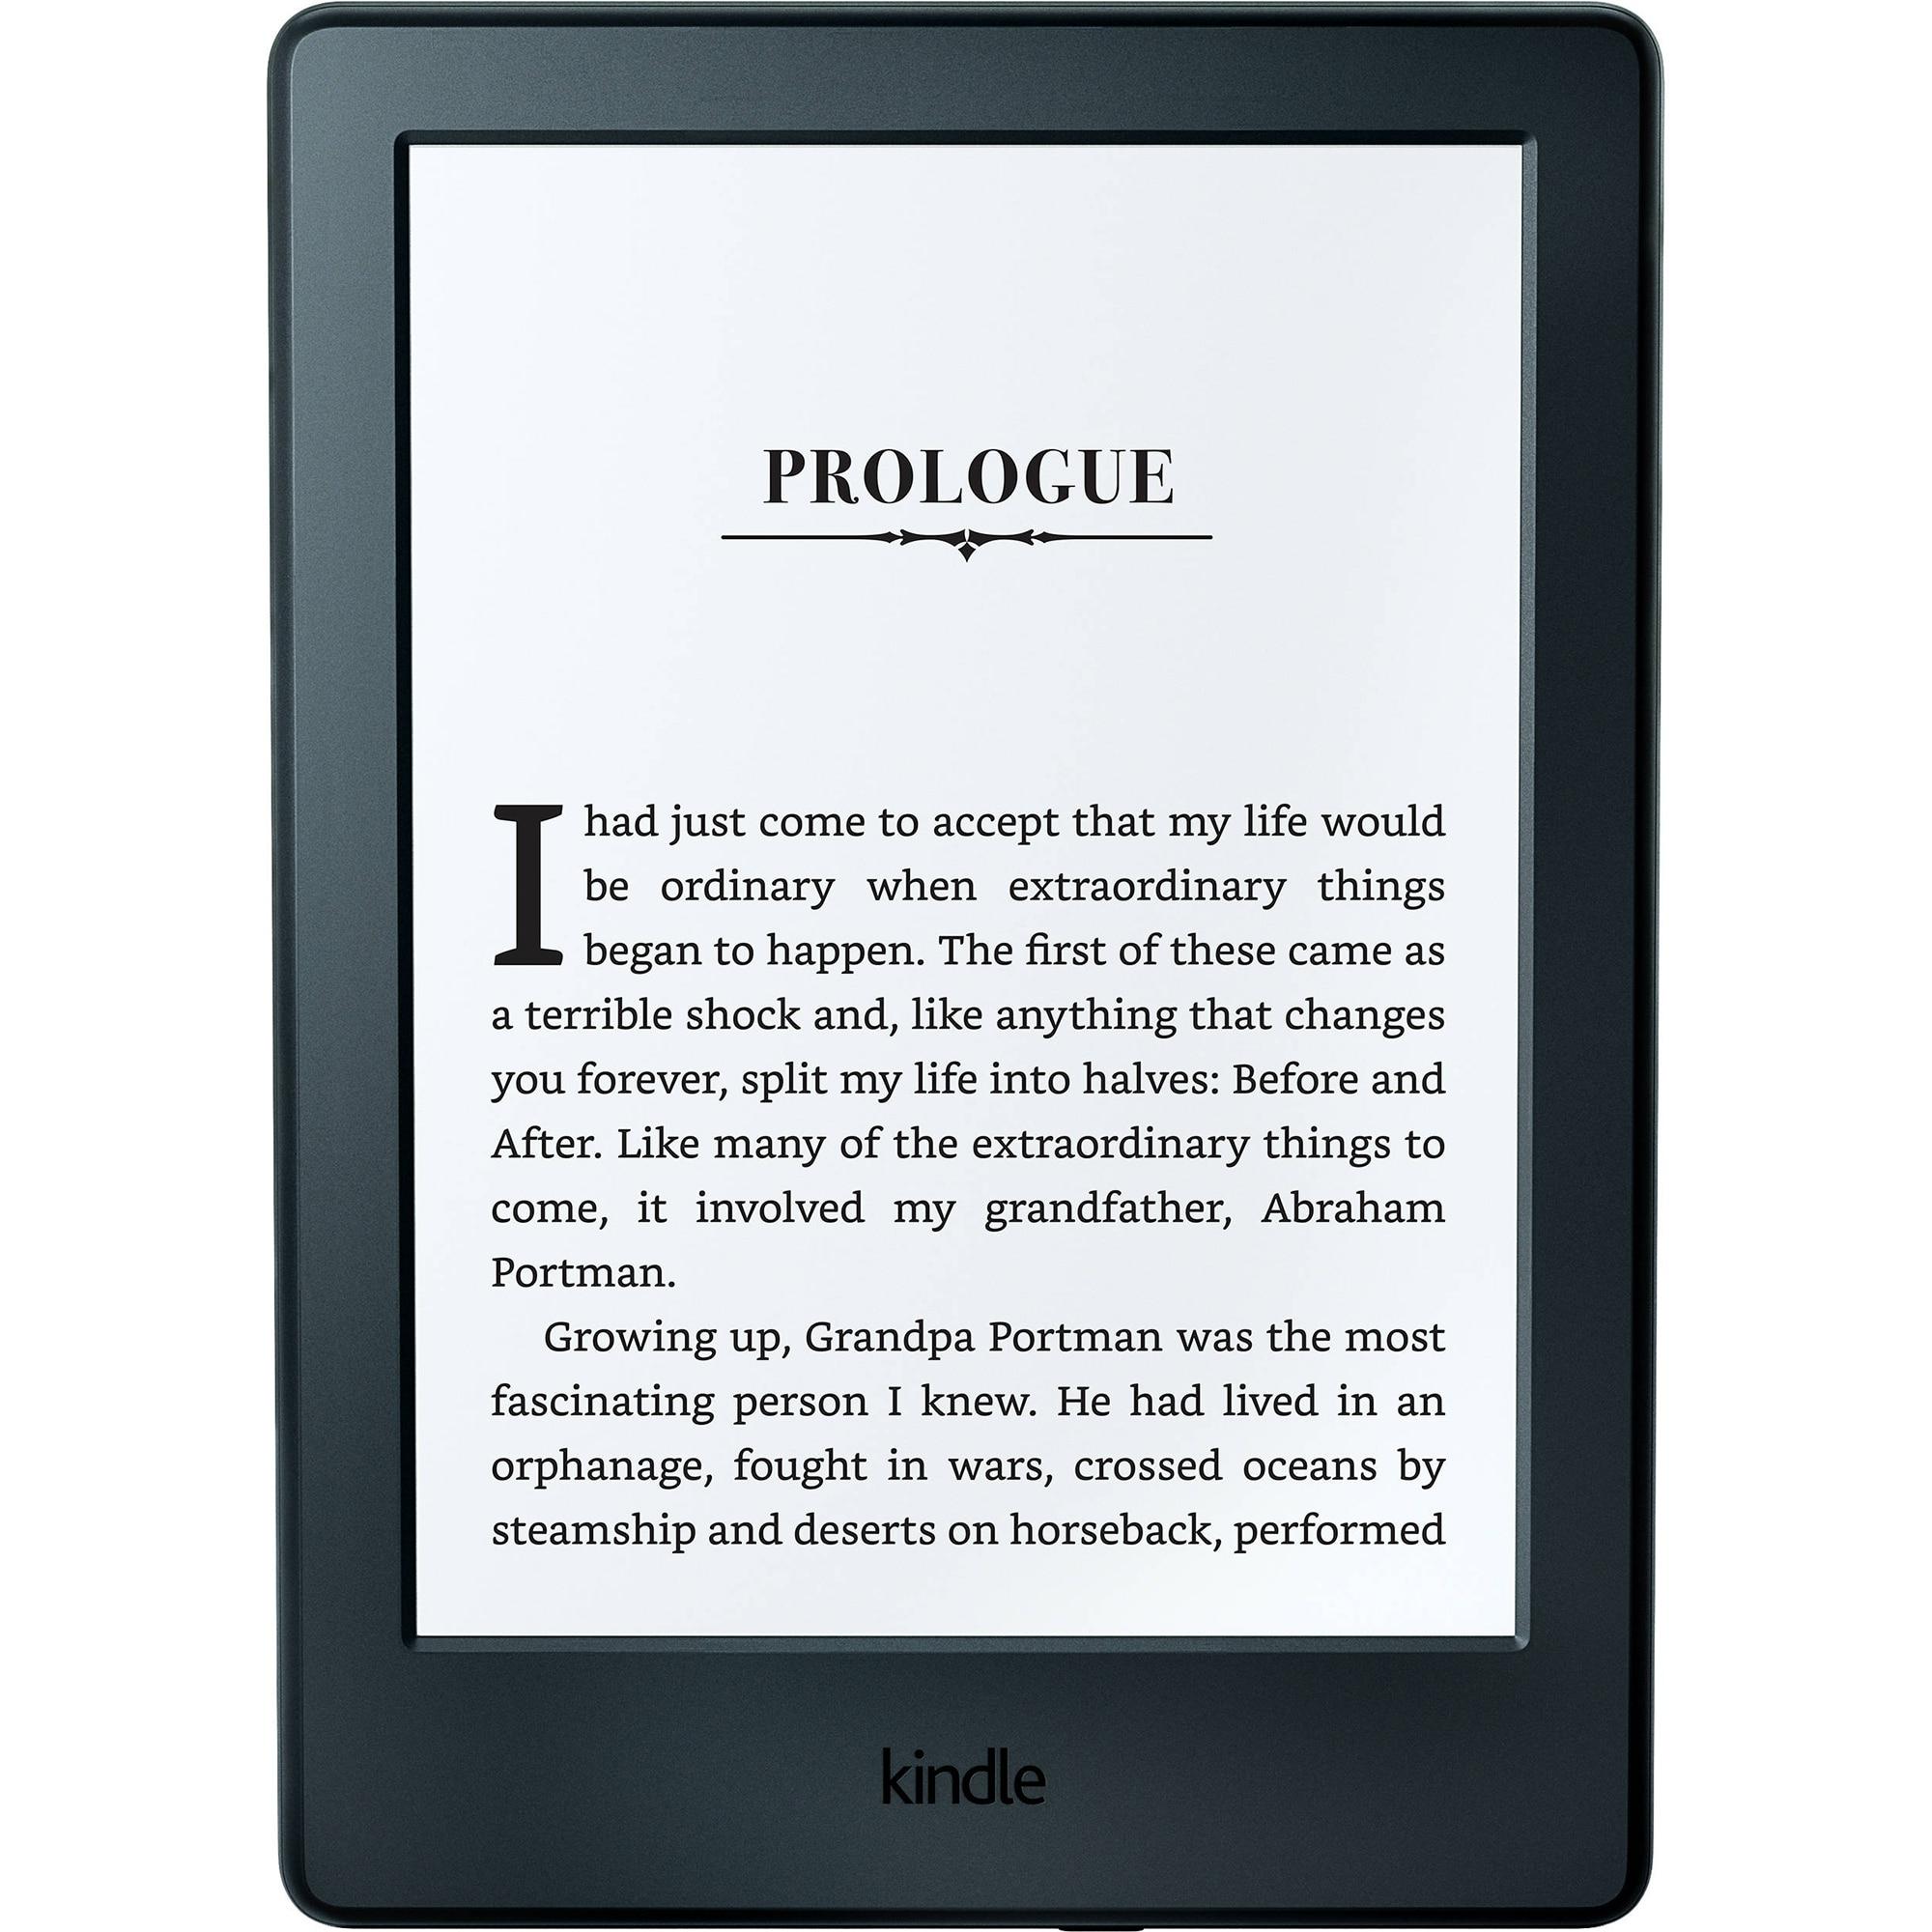 Fotografie eBook Reader New Kindle Glare 6, Touch Screen, 8th Generation, Wi-Fi, Negru